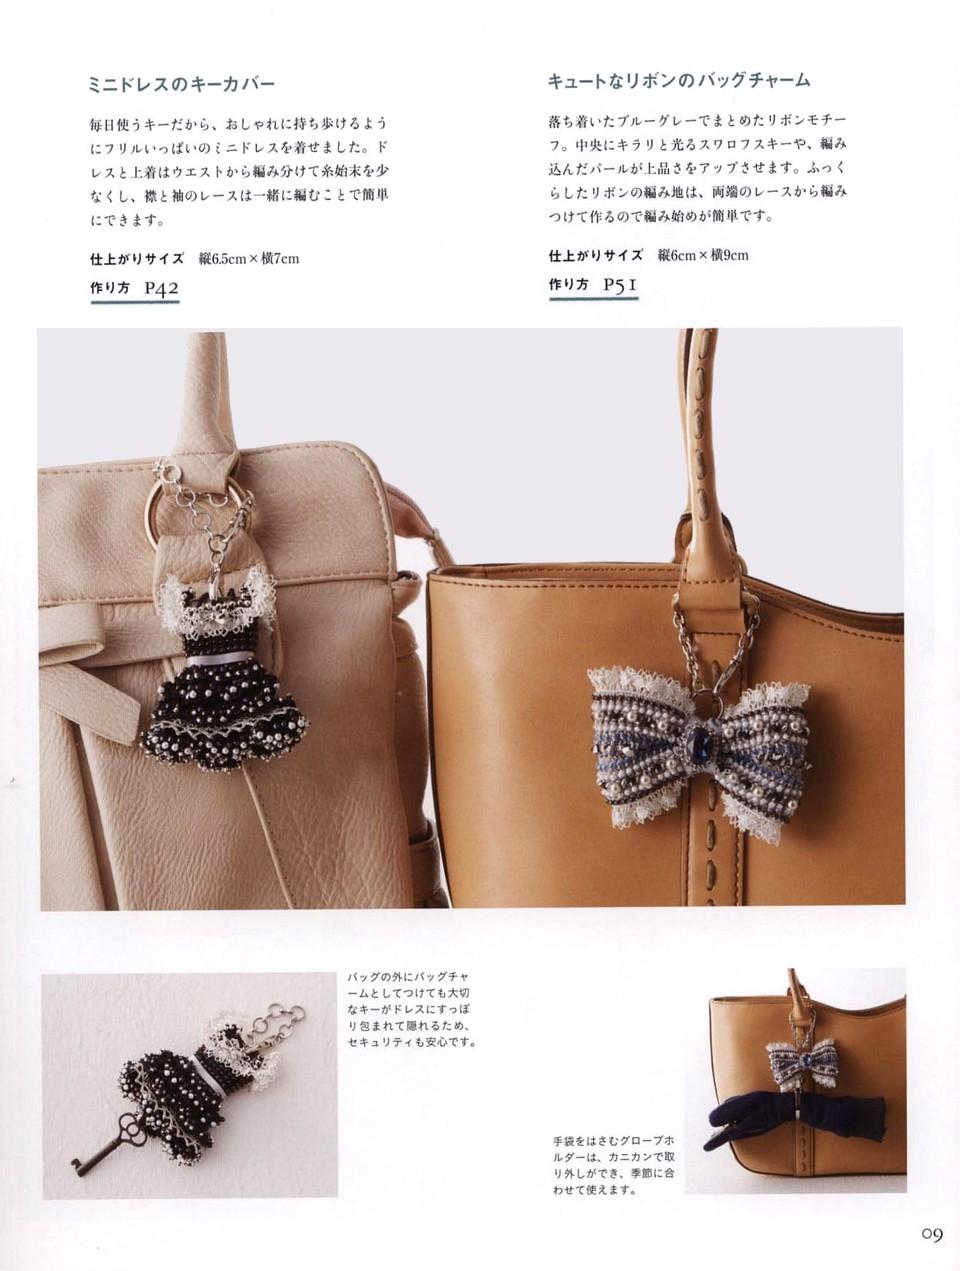 717 Beads Crochet 17-10